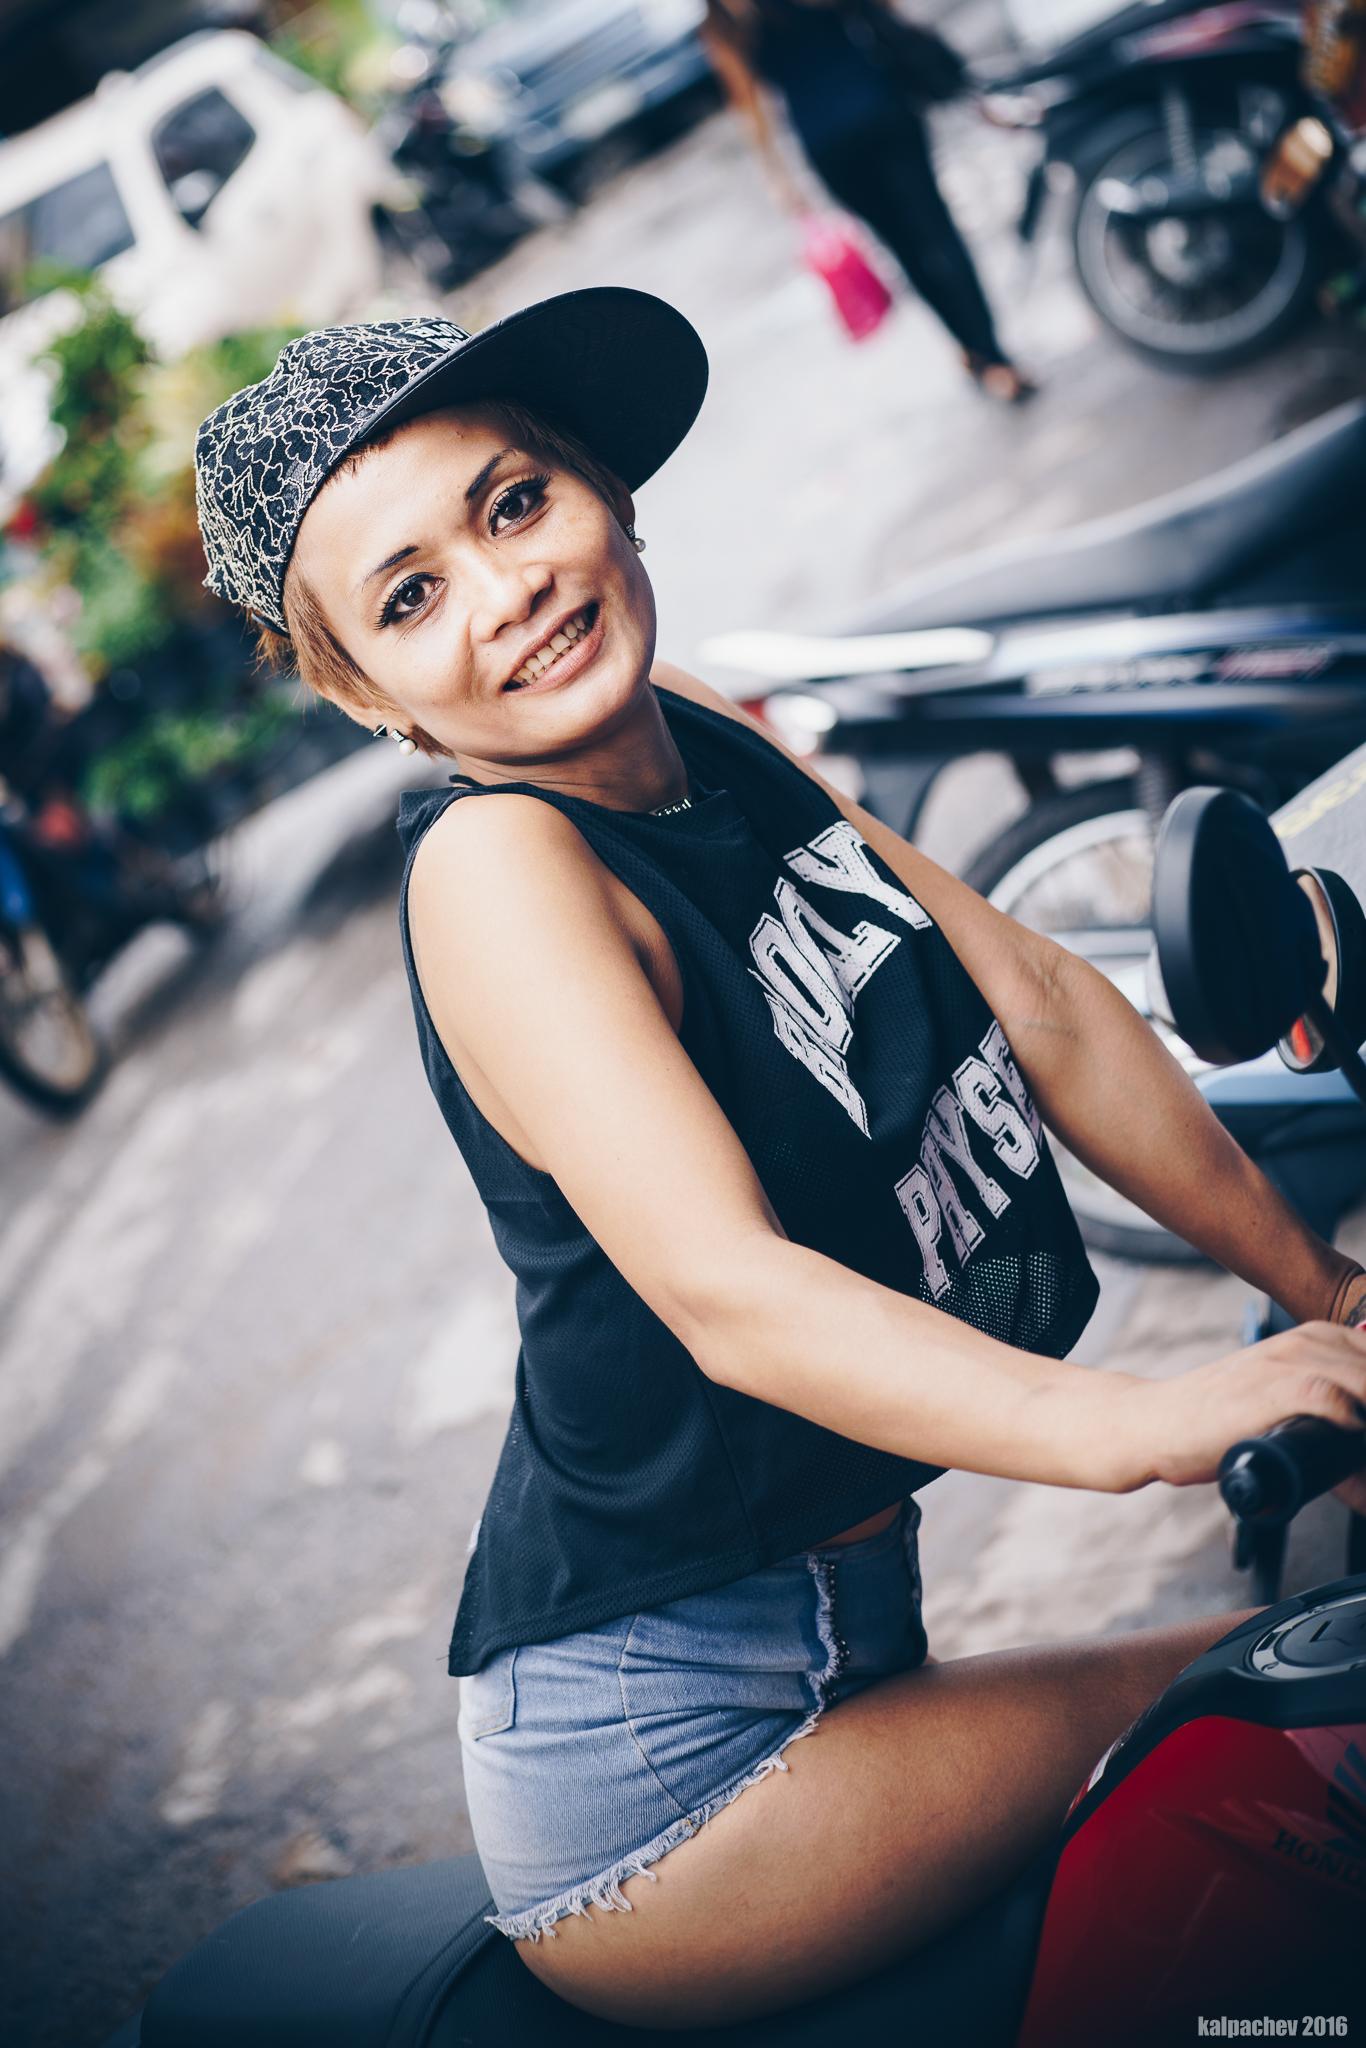 Faces of Pattaya